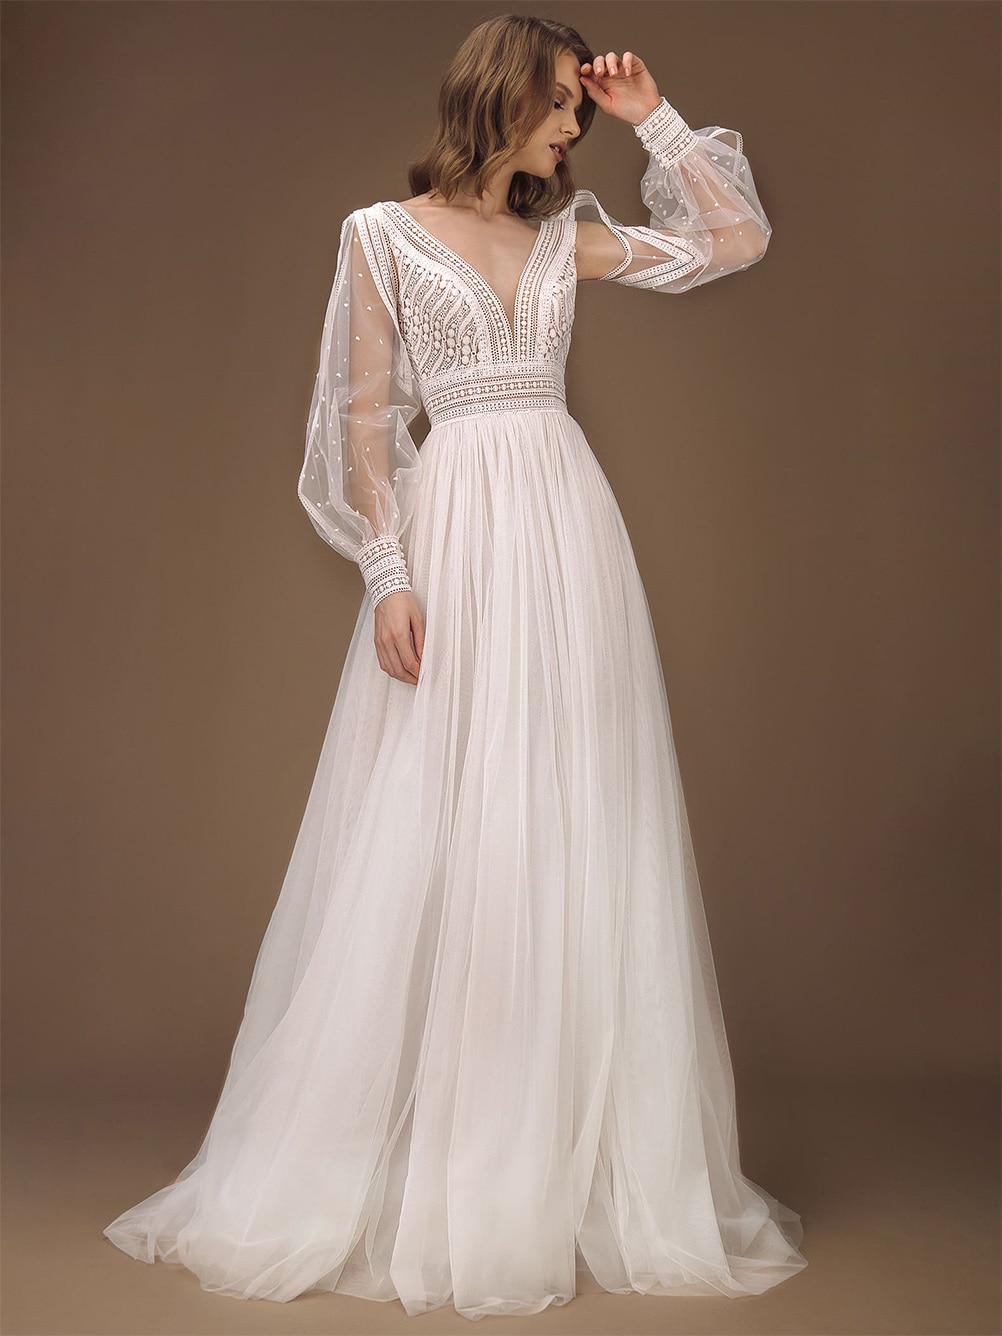 v-neck-lace-long-sheer-sleeves-boho-beach-bridal-gown-2021-backless-photography-custom-made-a-line-pre-wedding-shoot-dress